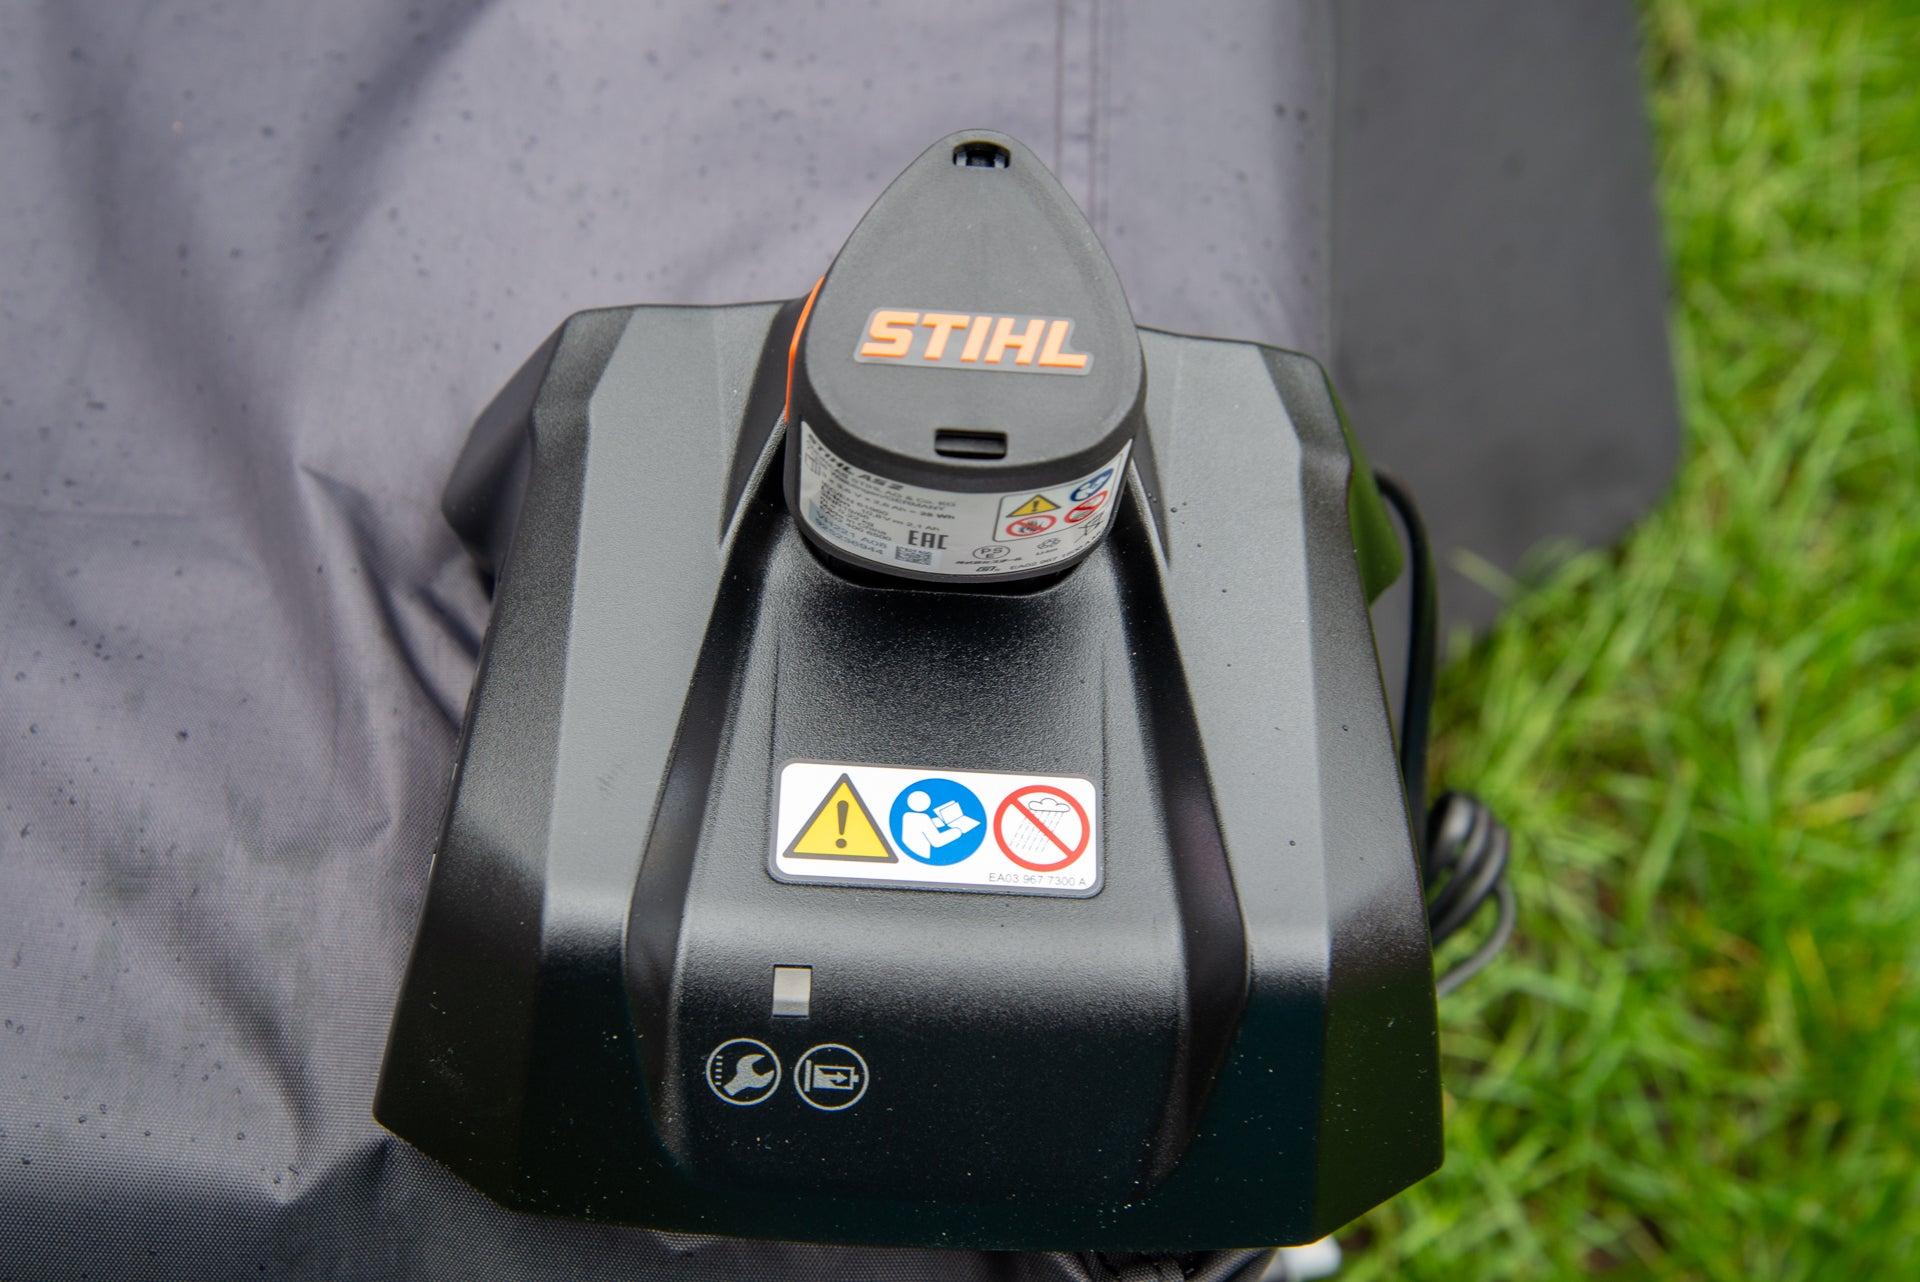 Stihl GTA 26 battery charger